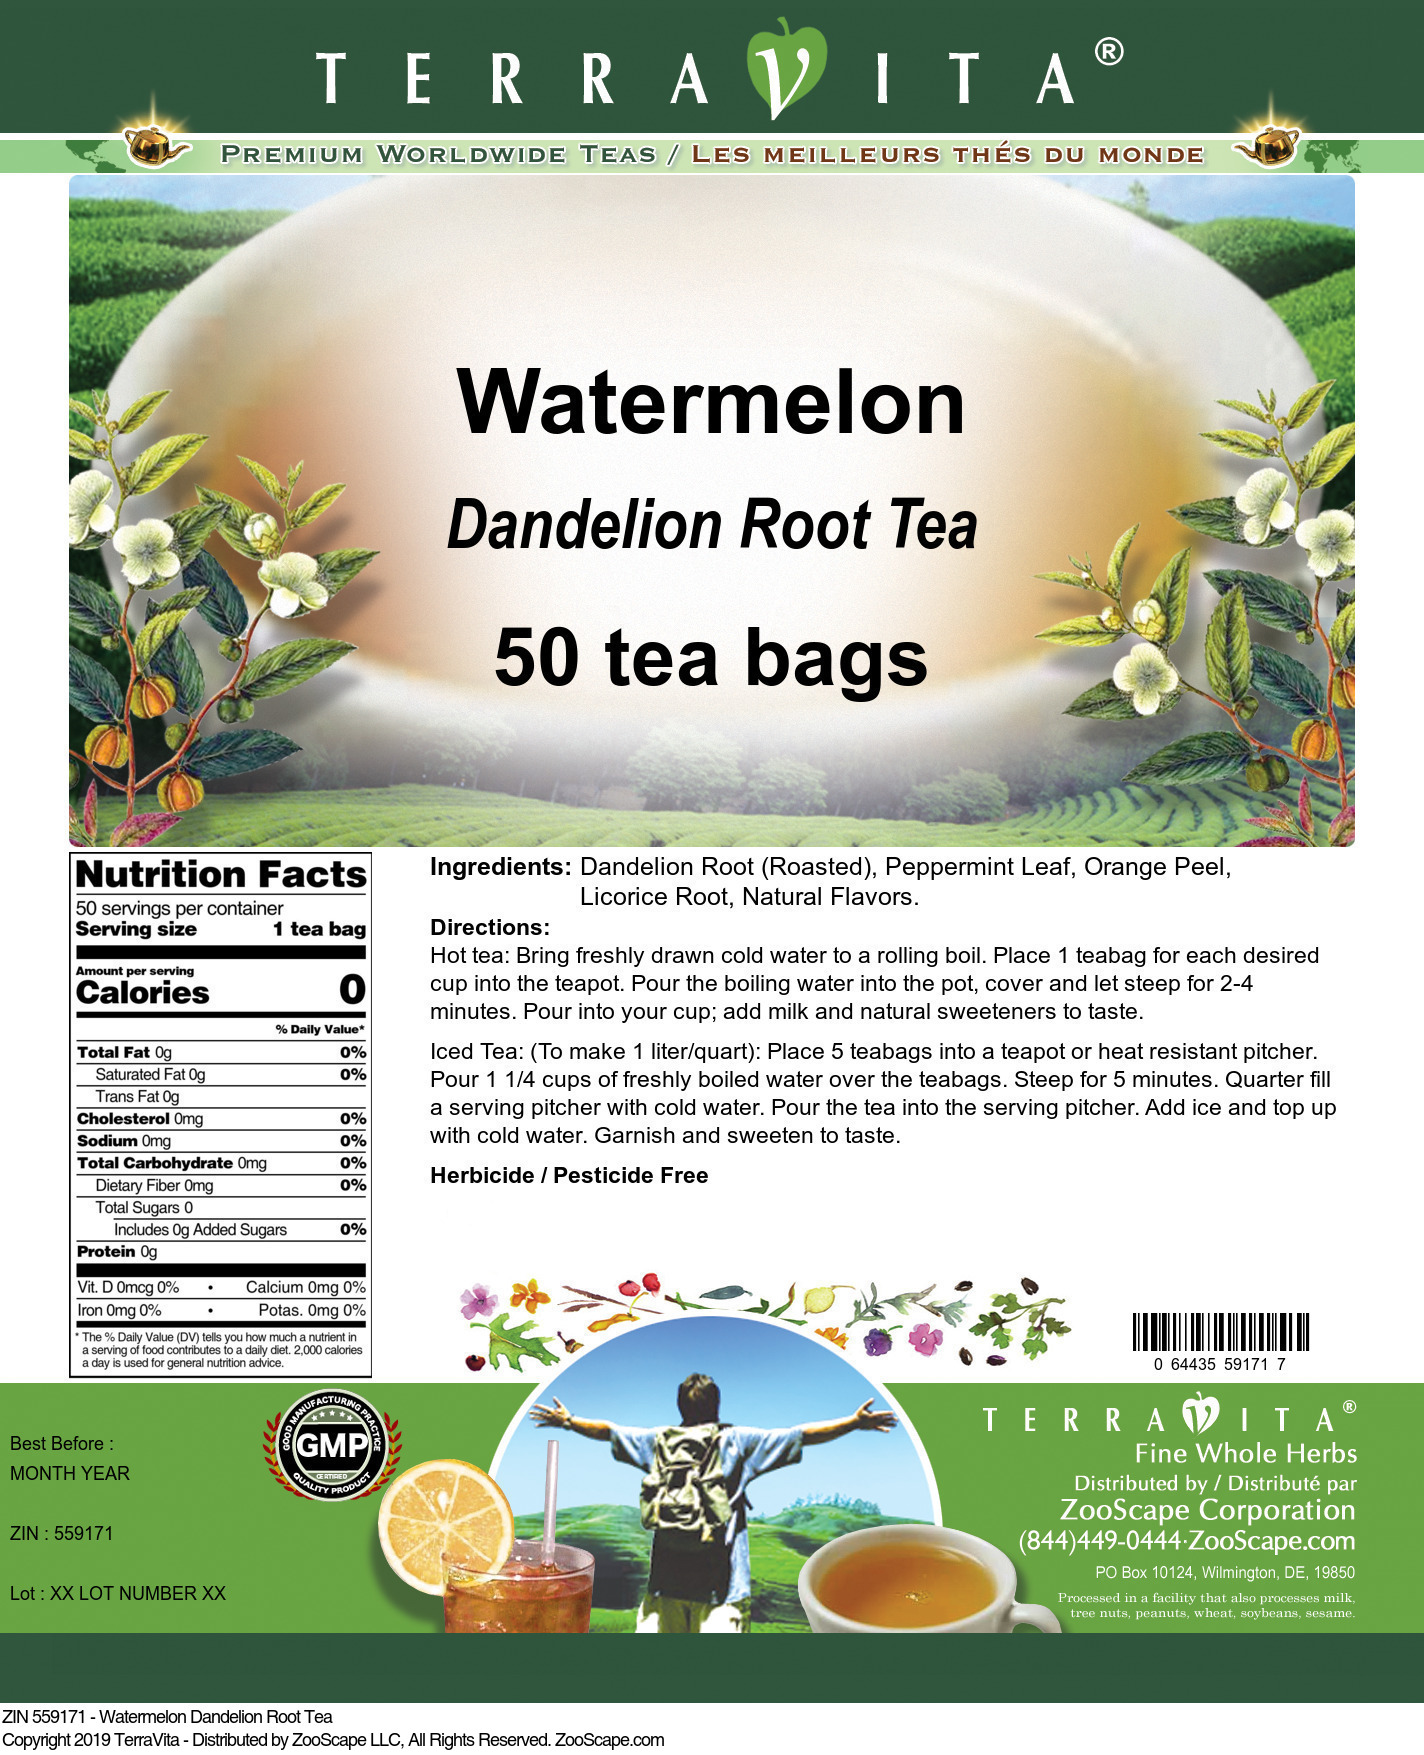 Watermelon Dandelion Root Tea